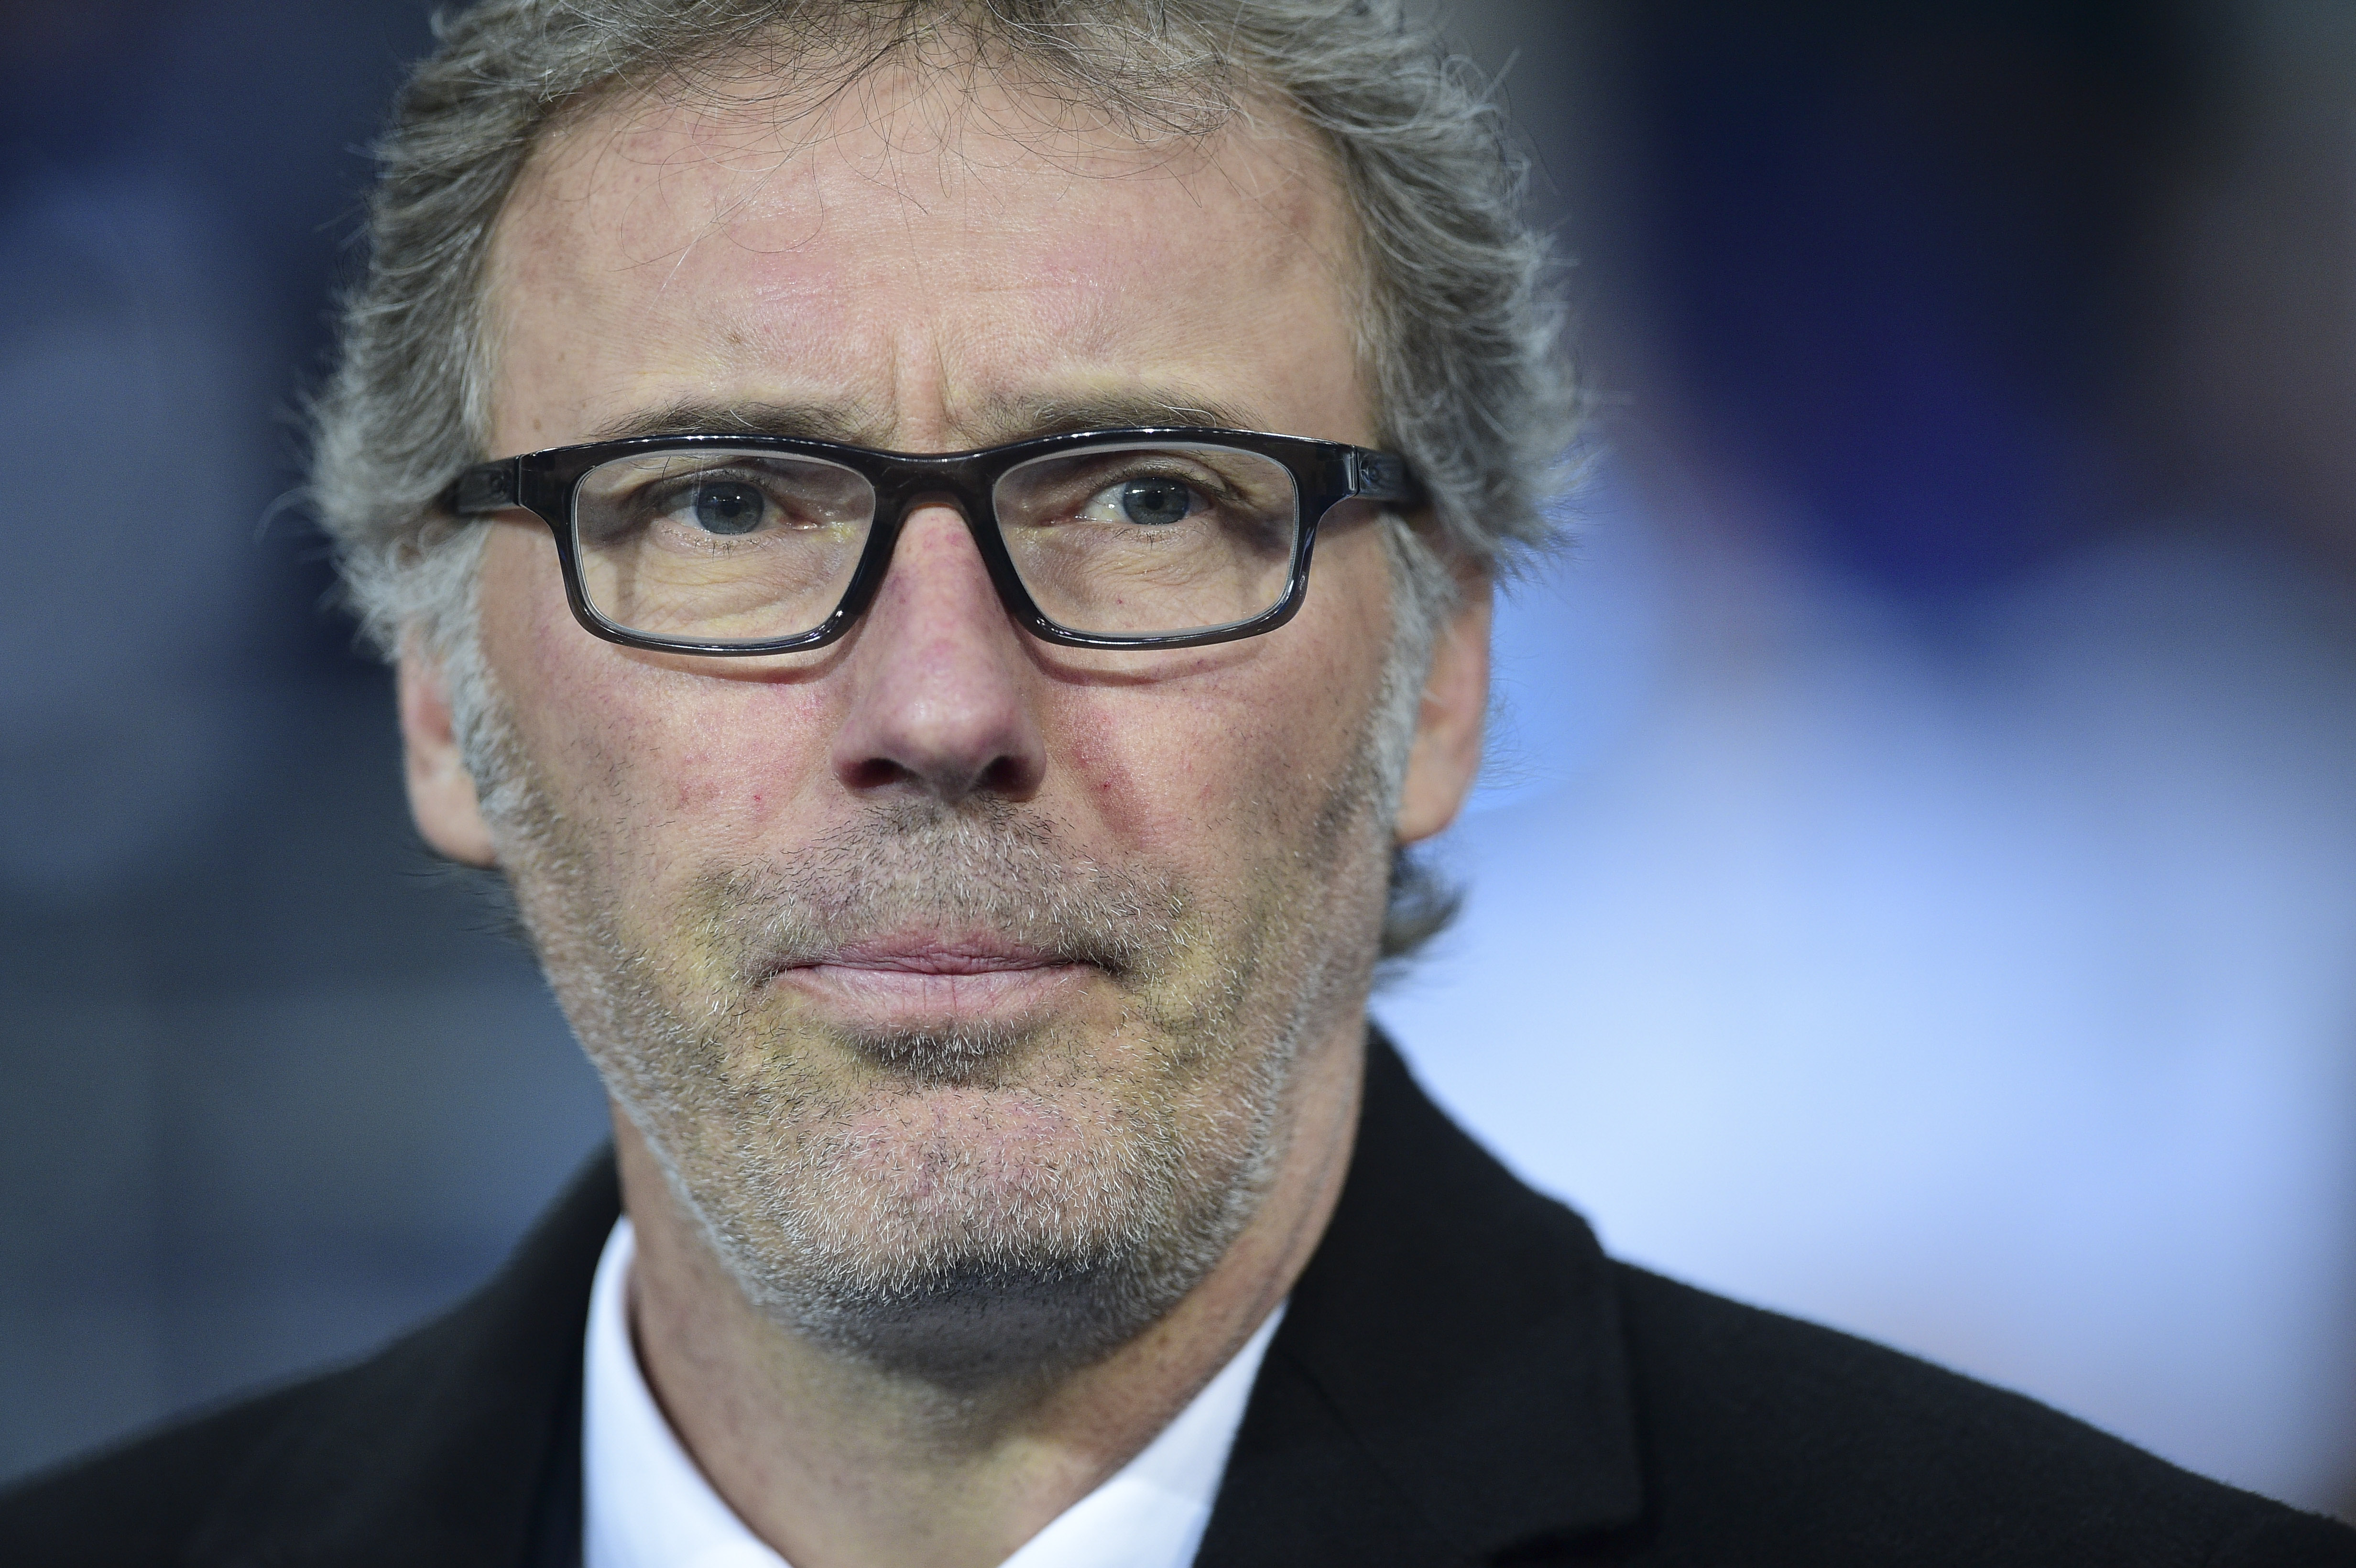 Football - Euro 2016 - Blanc ou Wenger pour redresser l'Angleterre ?